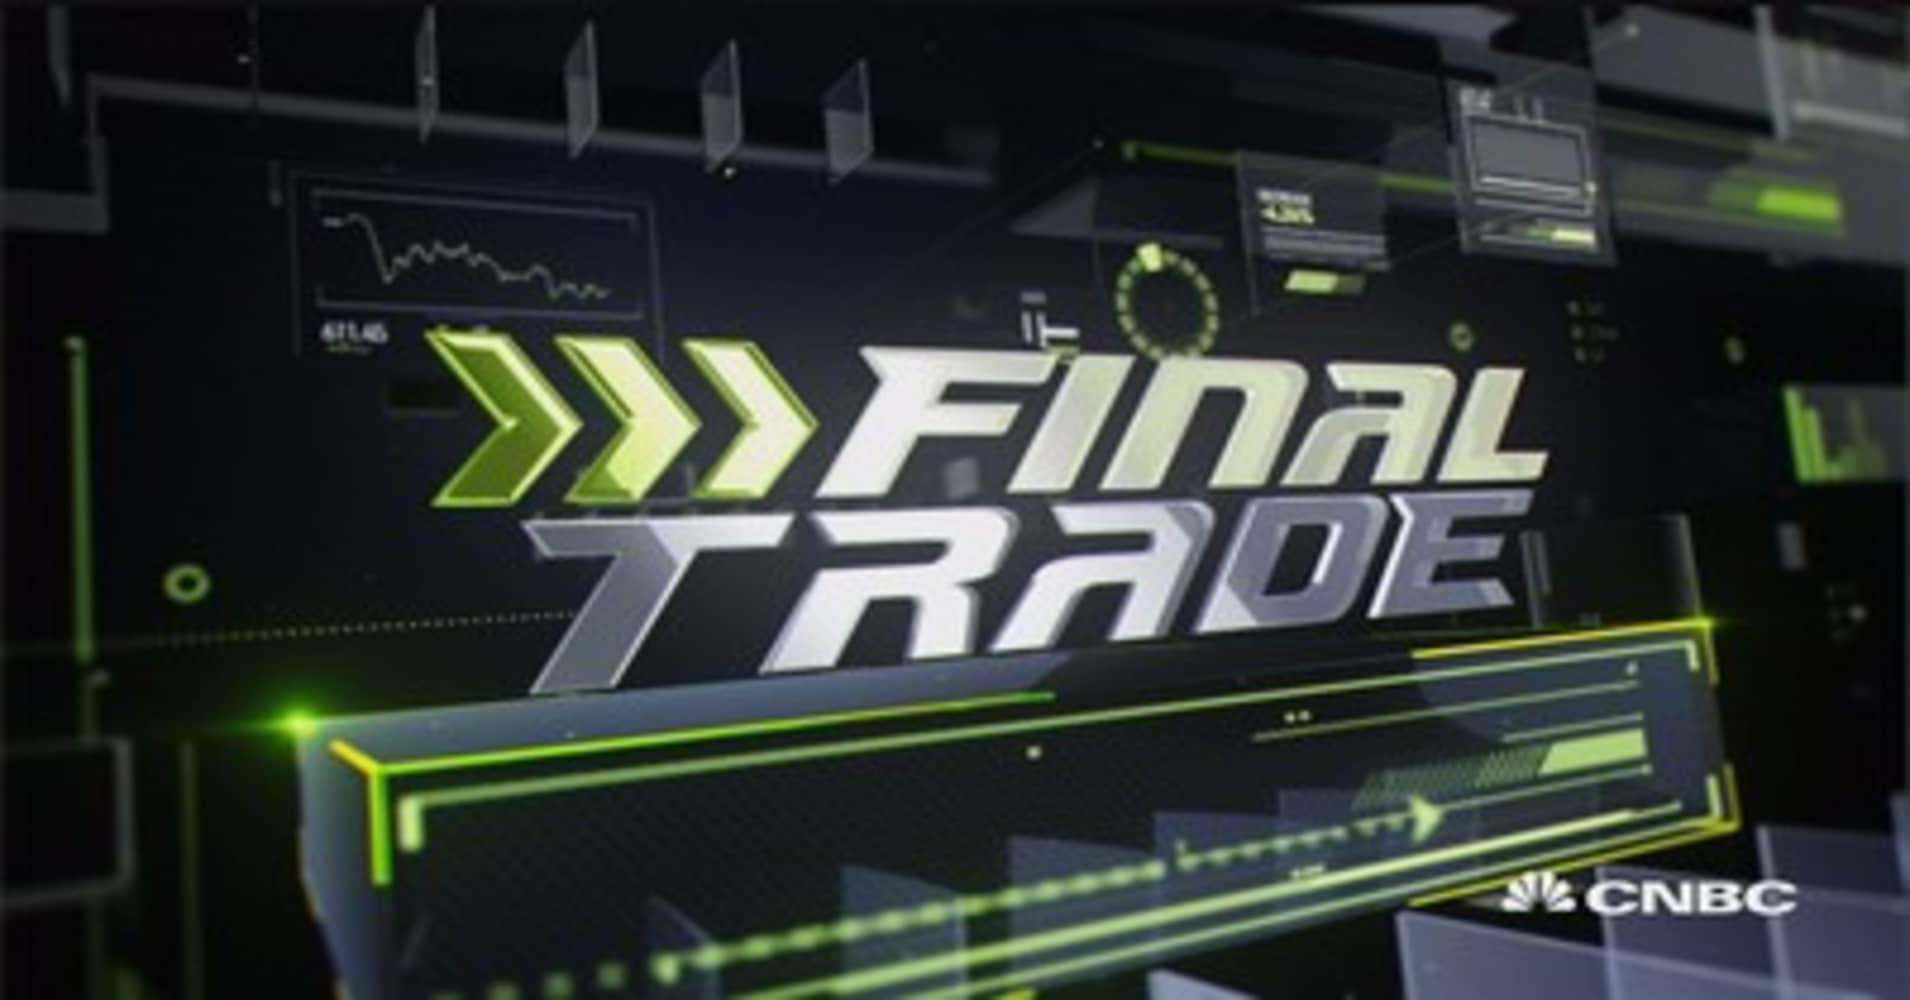 finl and fund international monetary